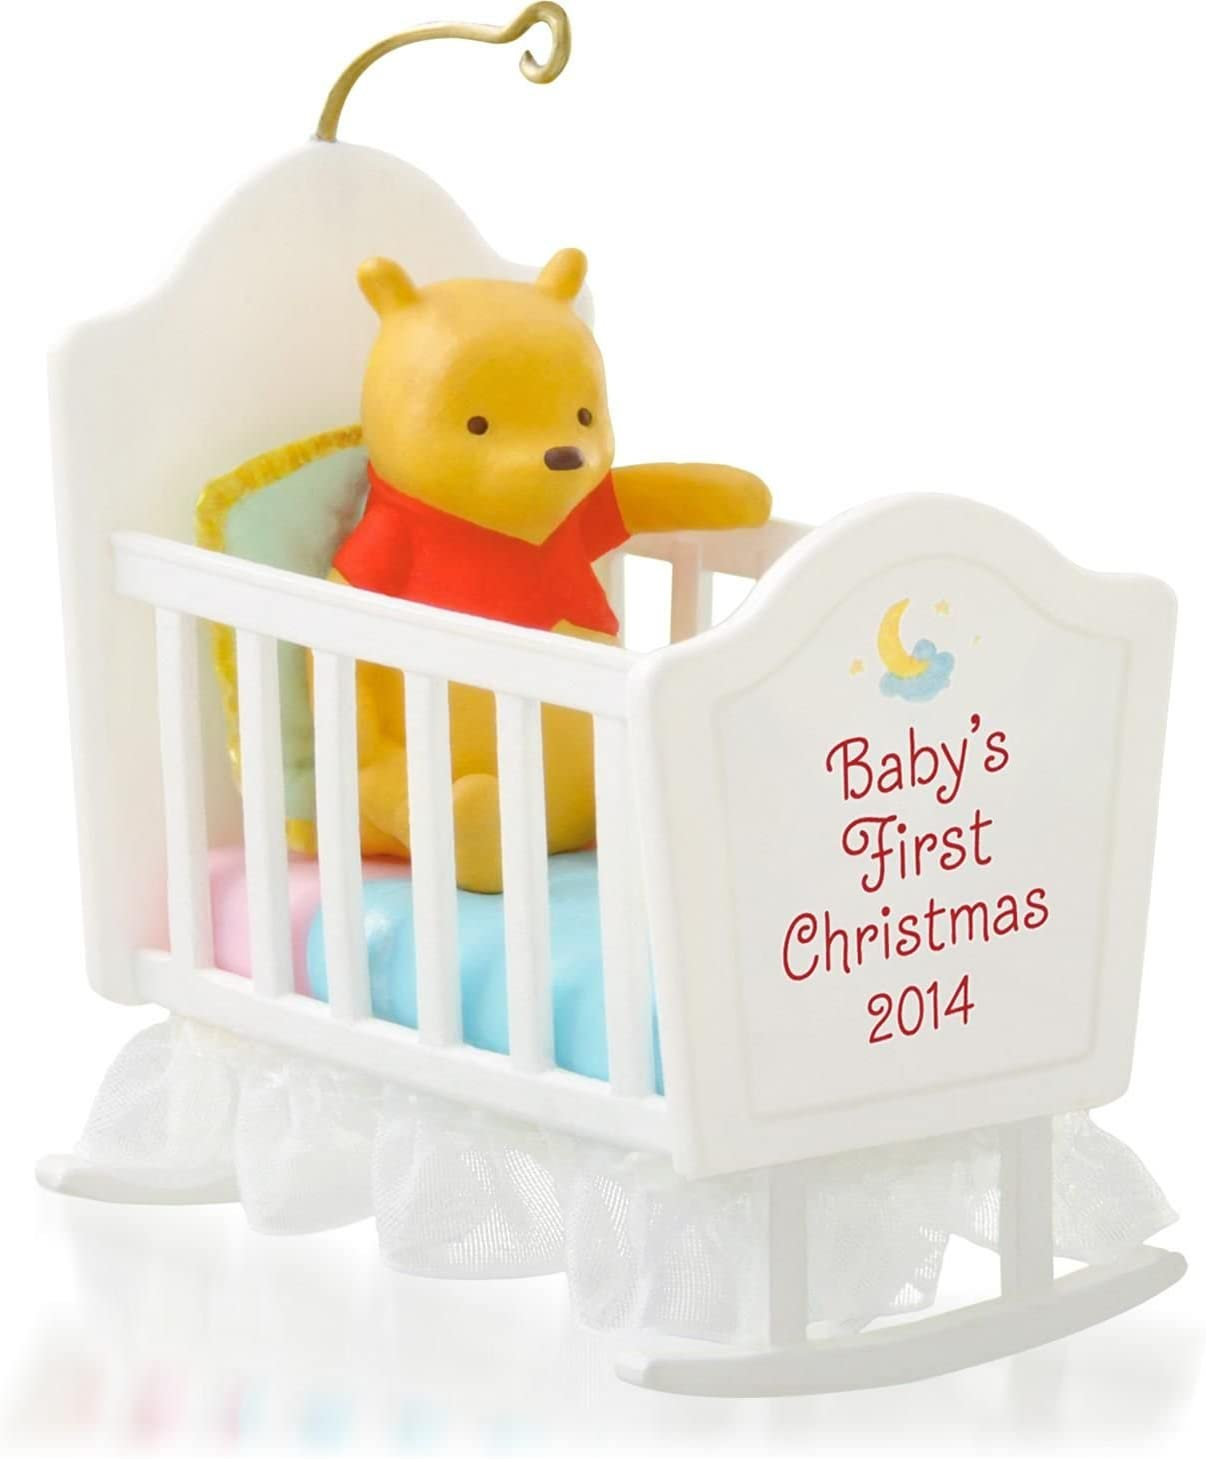 Hallmark 2014 Baby's First Christmas Winnie The Pooh Ornament